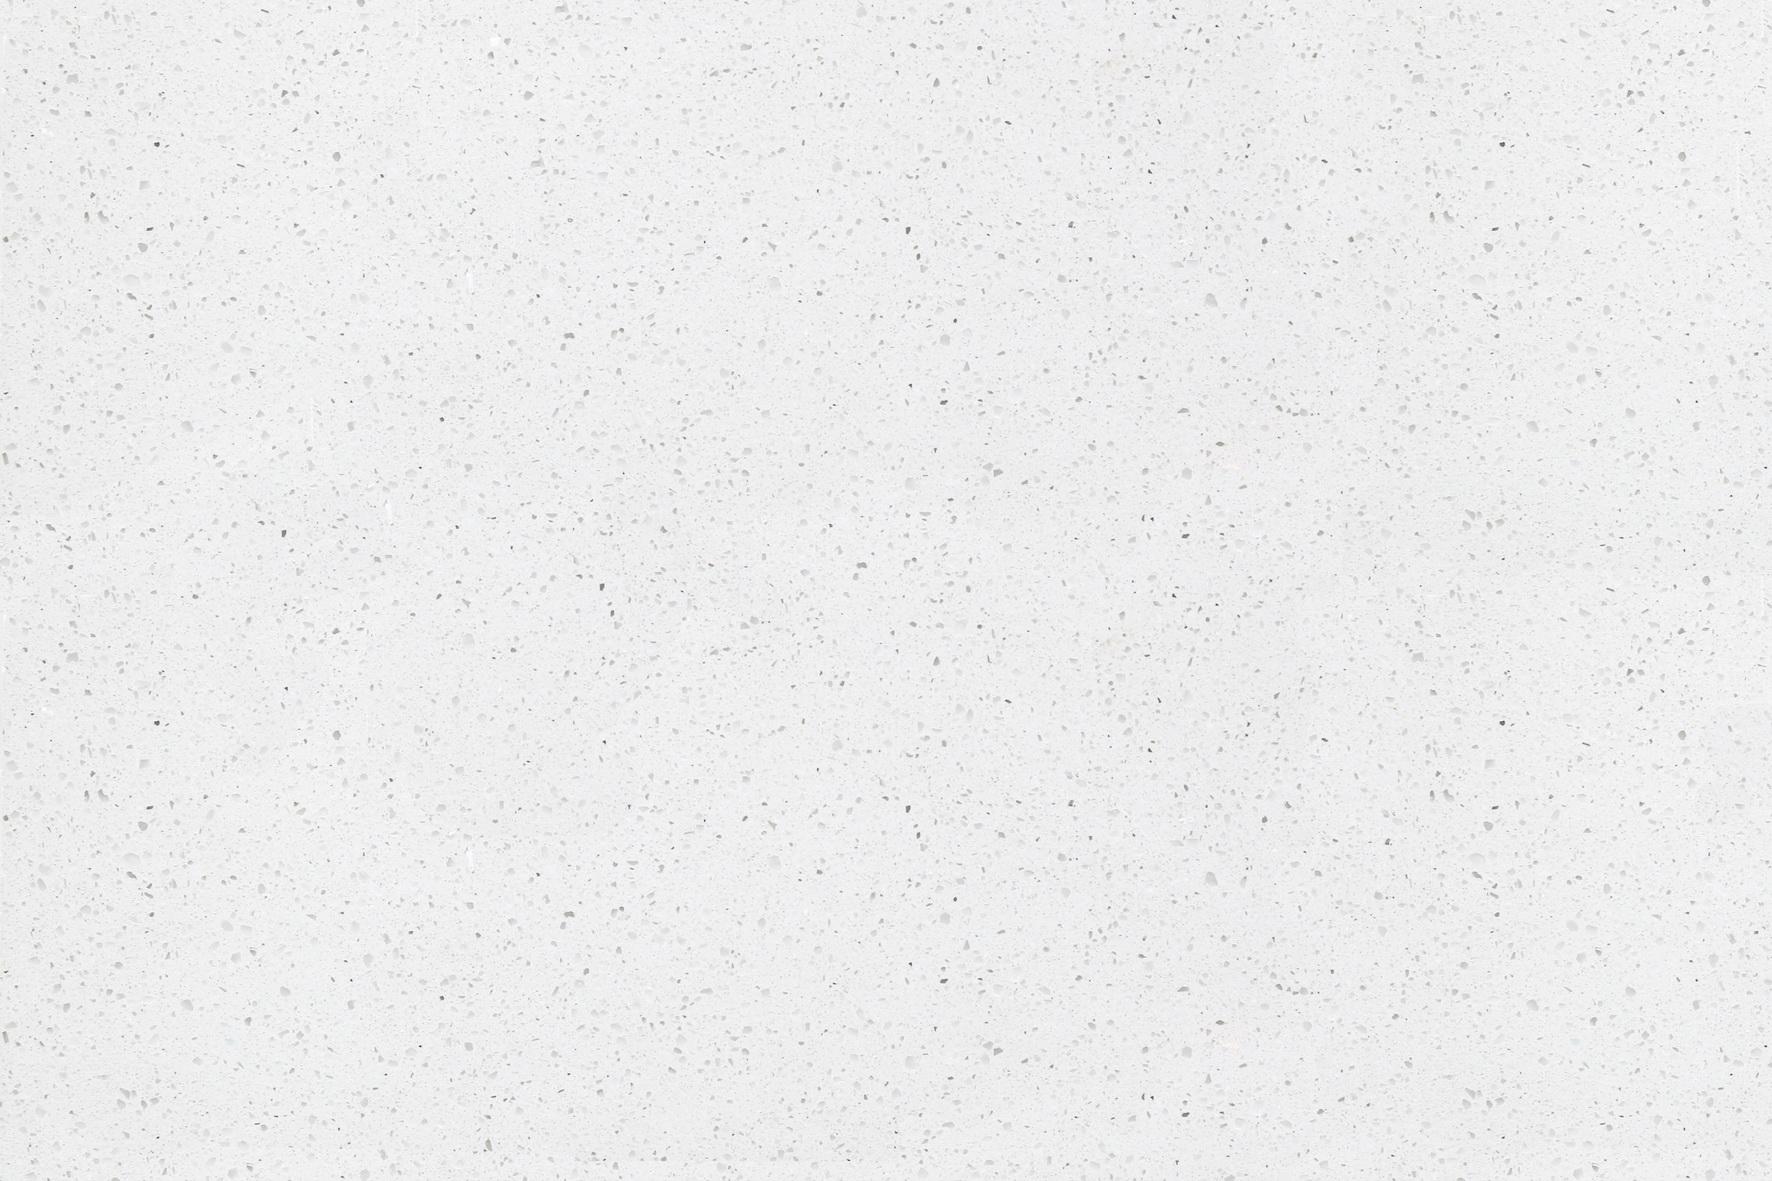 RAINBOW WHITE UNIPLUS UNIPLUS LUCIDE Foto: 1_50196_37635.jpg